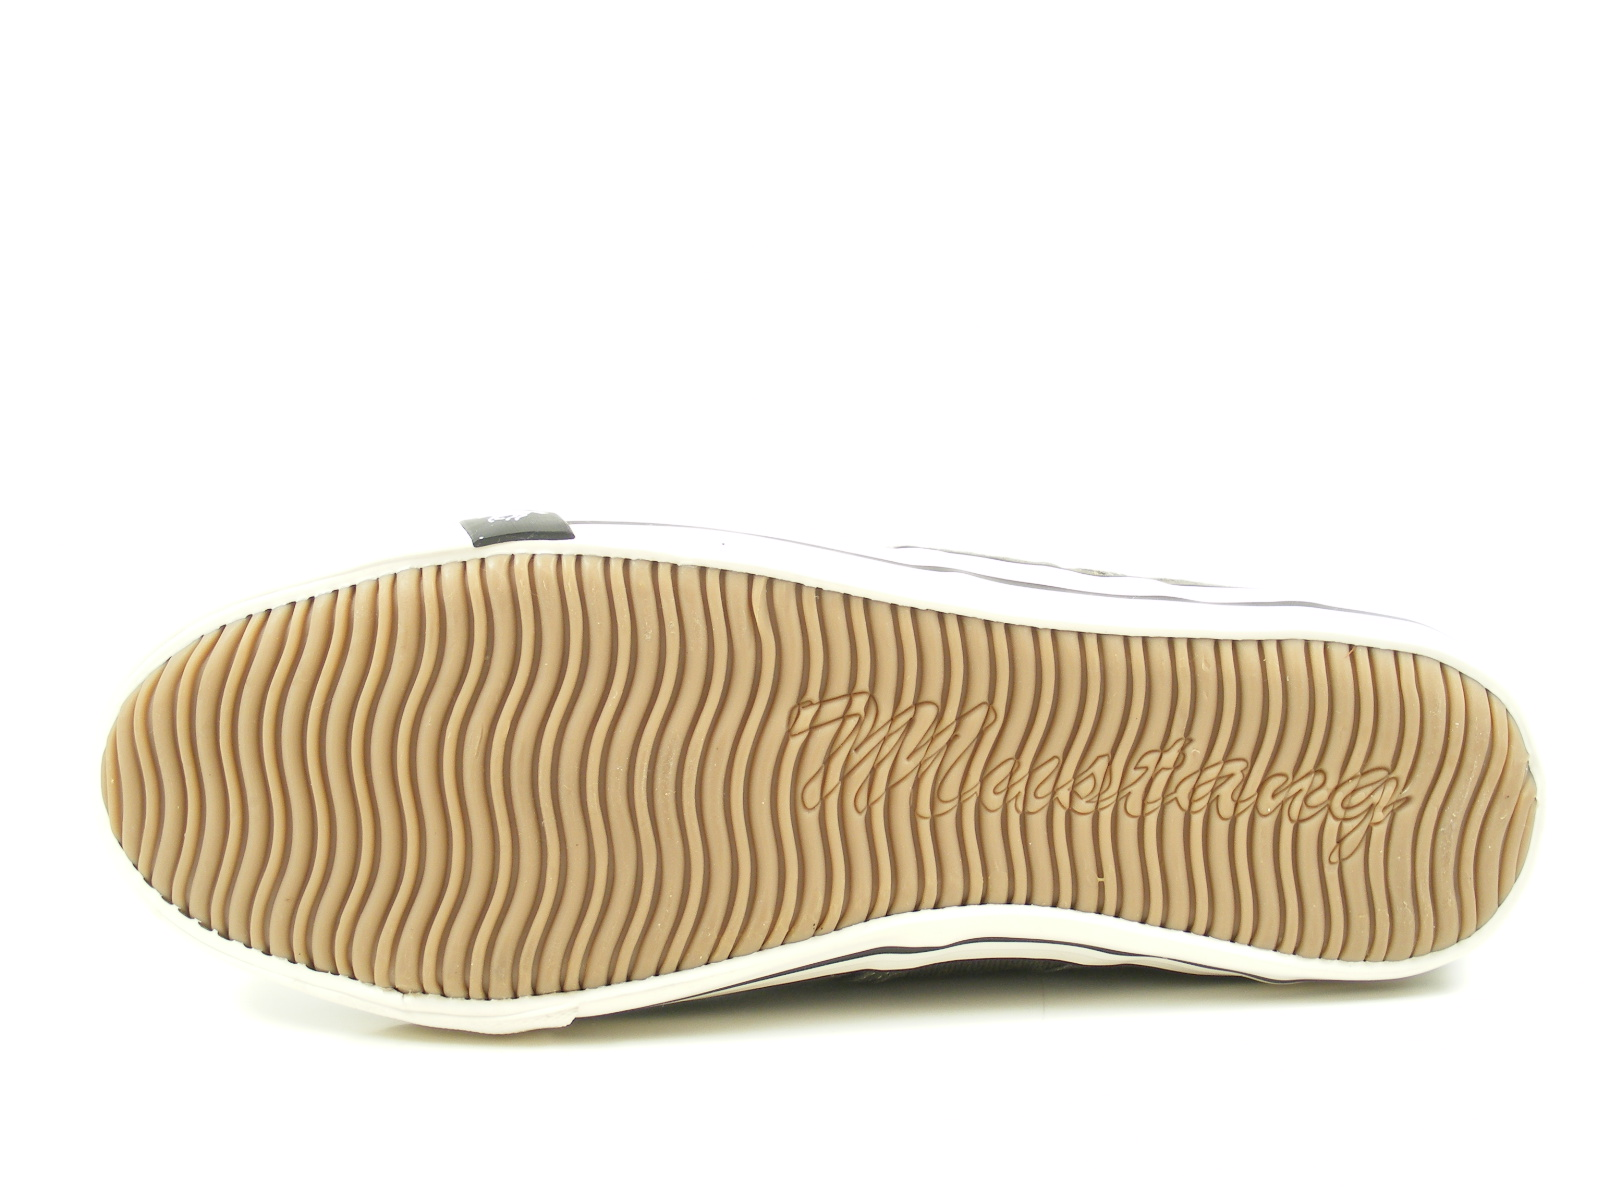 Mustang Schuhe Herren Slipper Sneaker Canvas 4058-401   eBay 12e9d7bd03